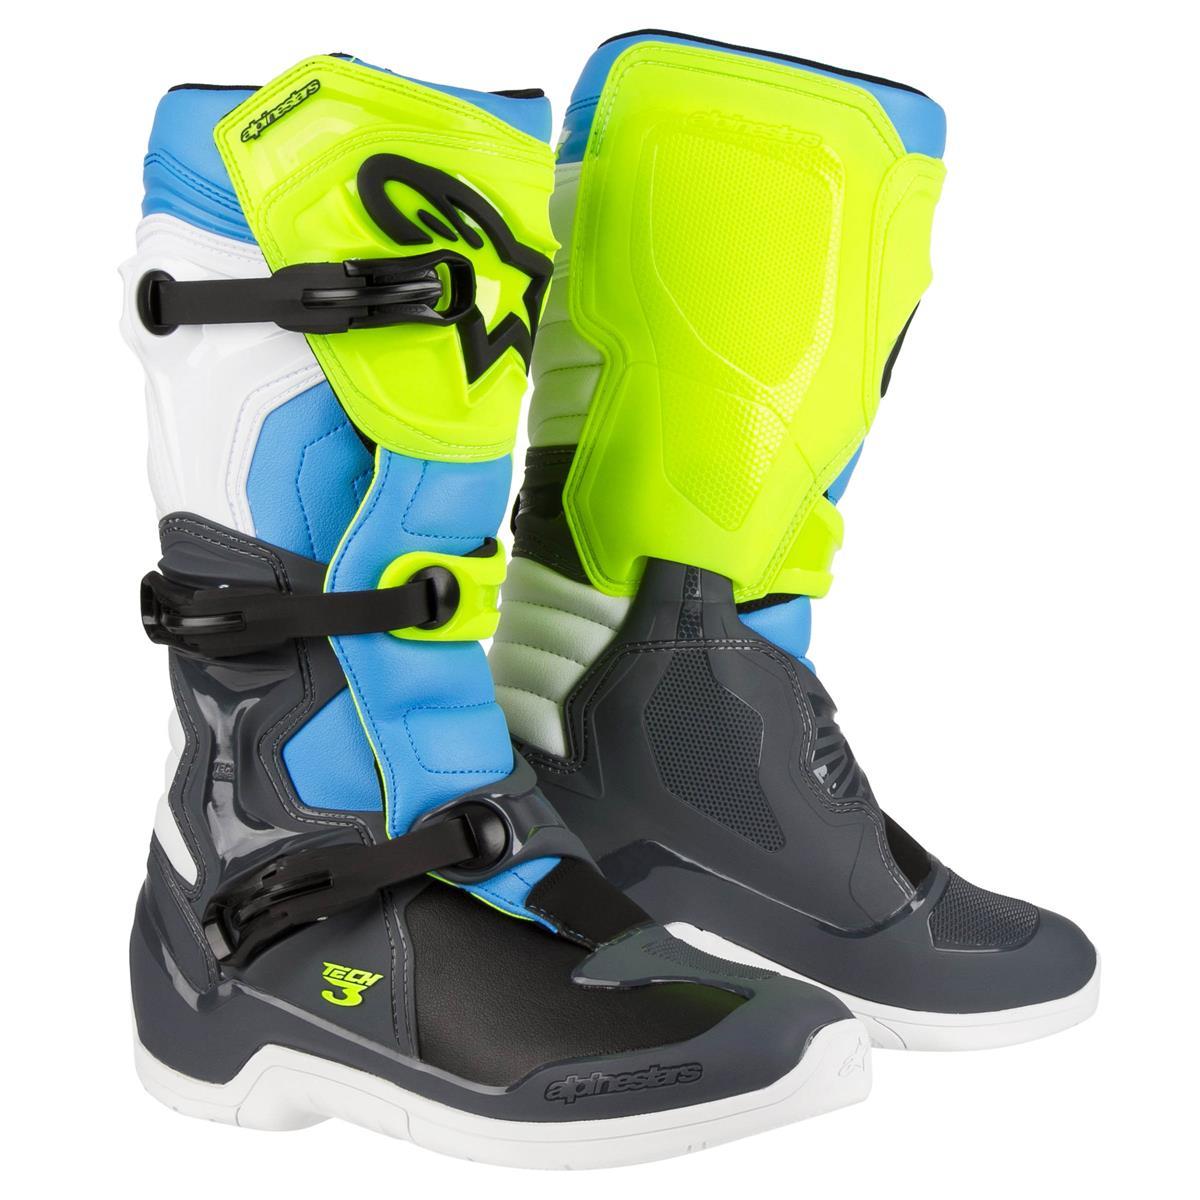 Alpinestars Motocross-Stiefel Tech 3 Cool Grau/Gelb/Fluo Cyan